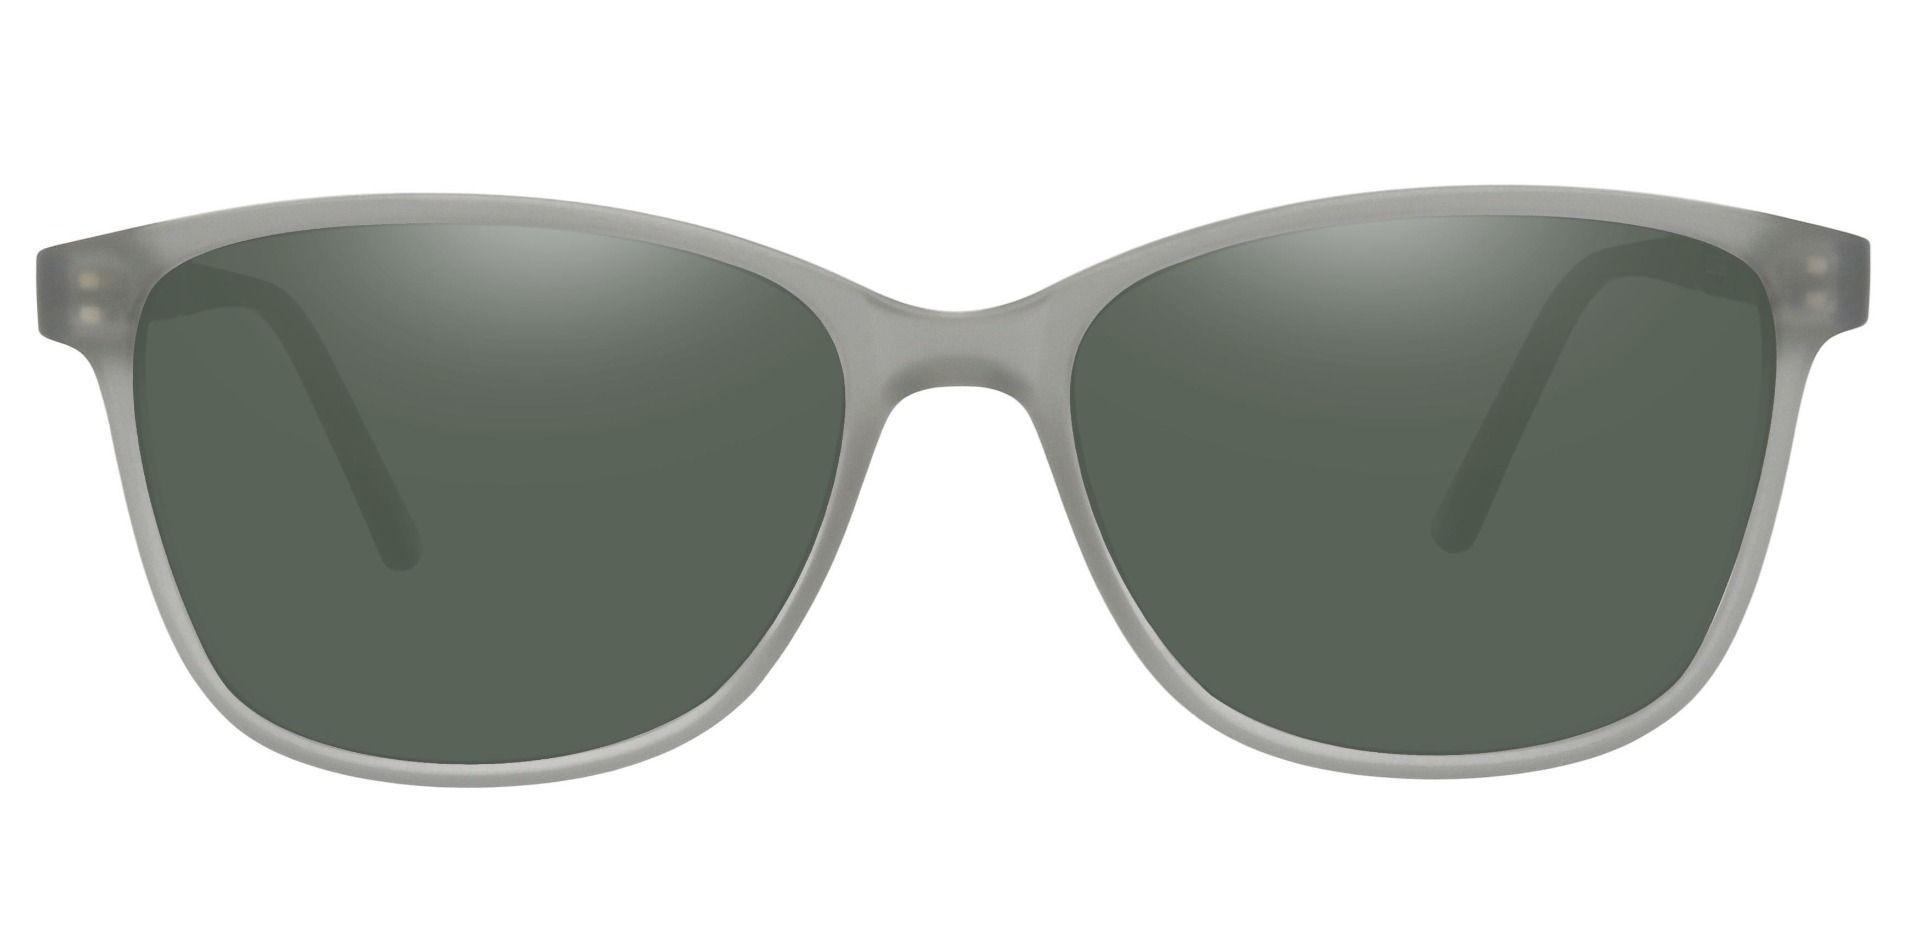 Argyle Rectangle Prescription Sunglasses - Gray Frame With Green Lenses